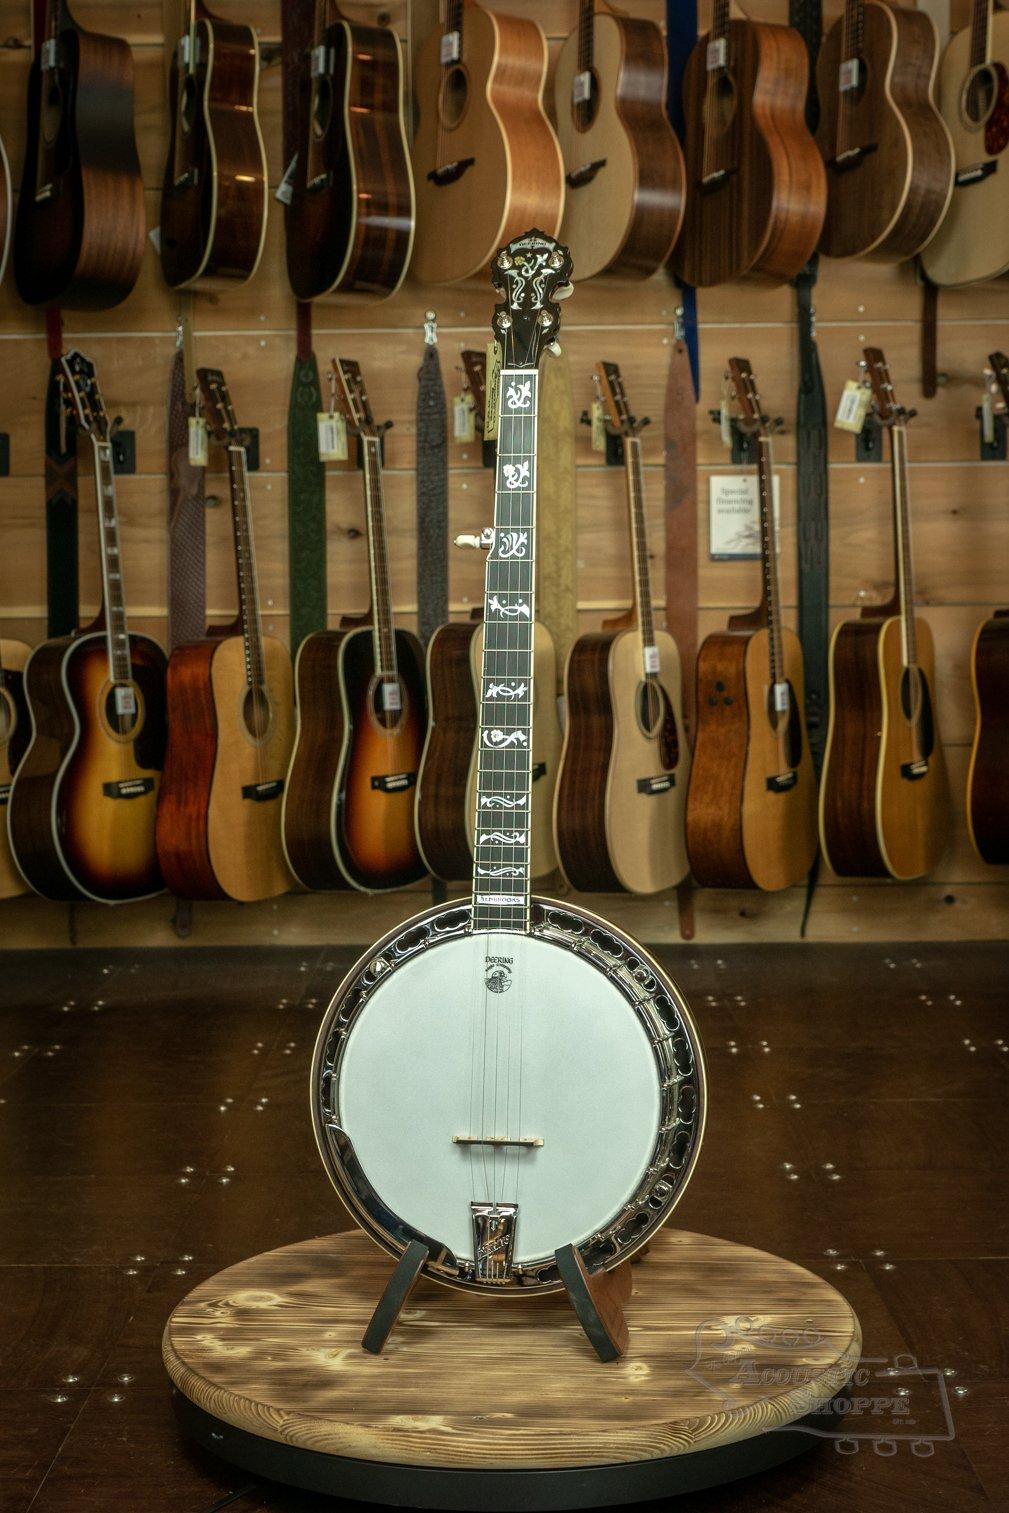 (Floor Model) Deering TENBROOKS SARATOGA STAR BANJO 5-String Banjo W/ 06 Tone Ring and FREE installed spikes